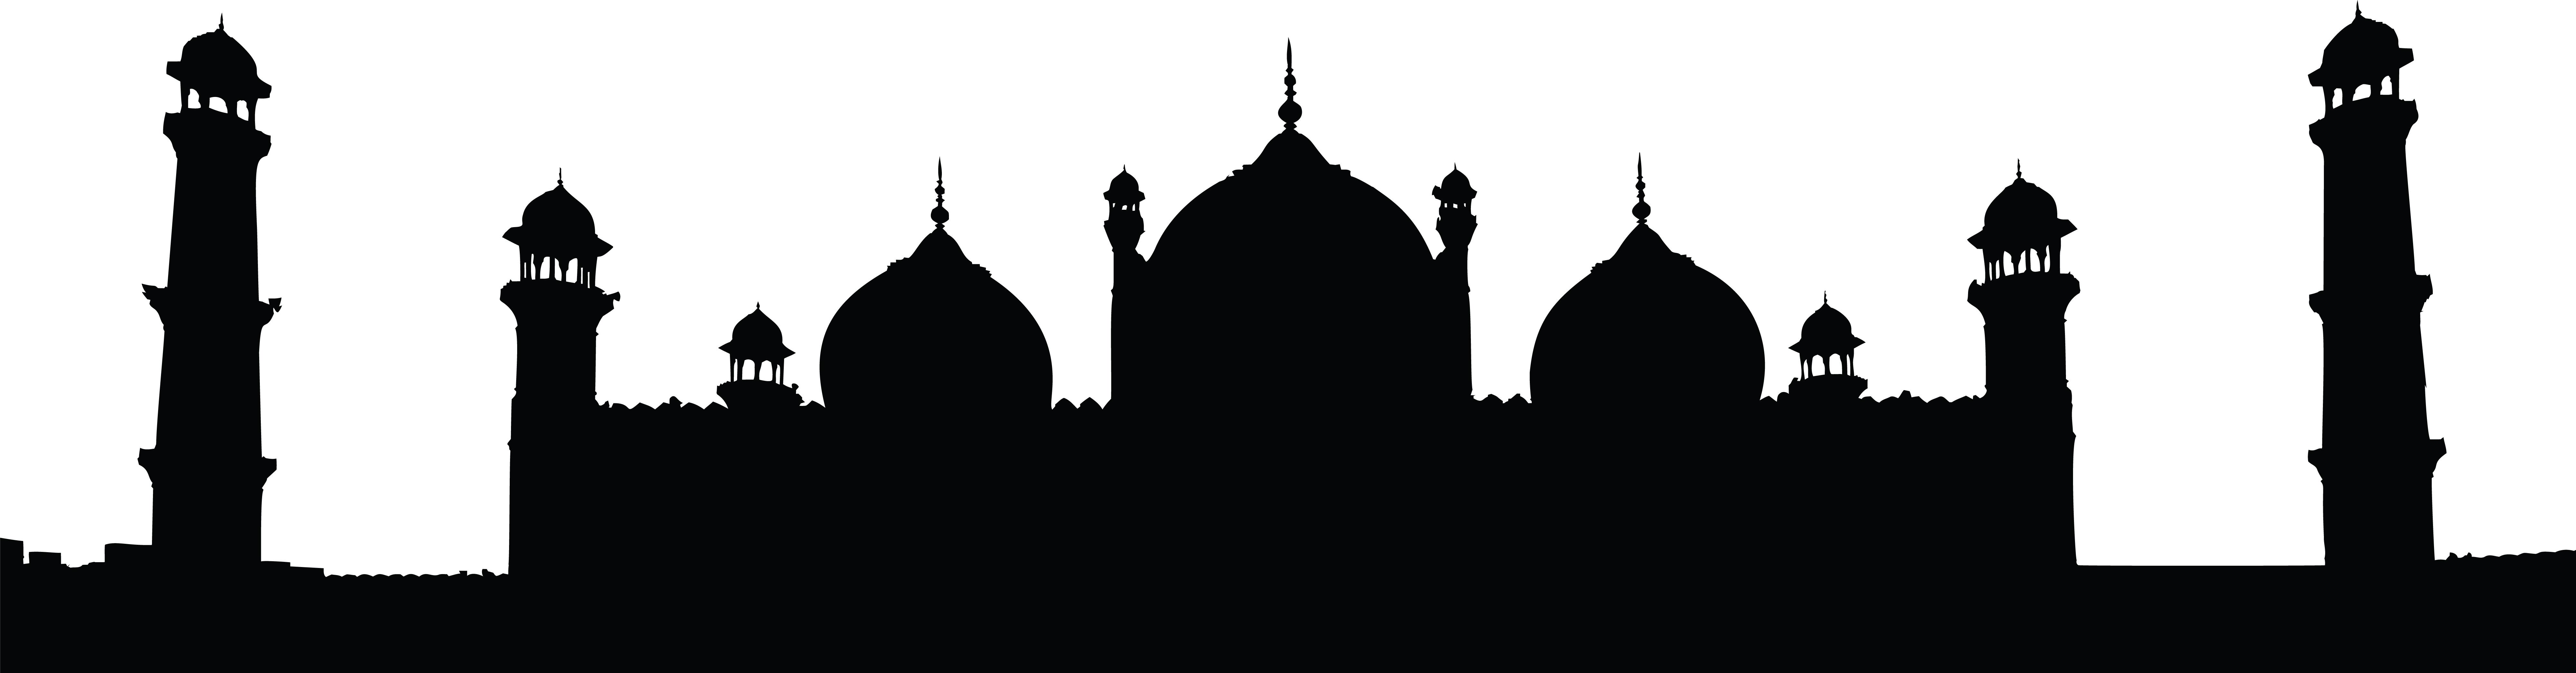 8000x2089 Clipart Of A Badshahi Mosque Lahore Pakistan Black And White